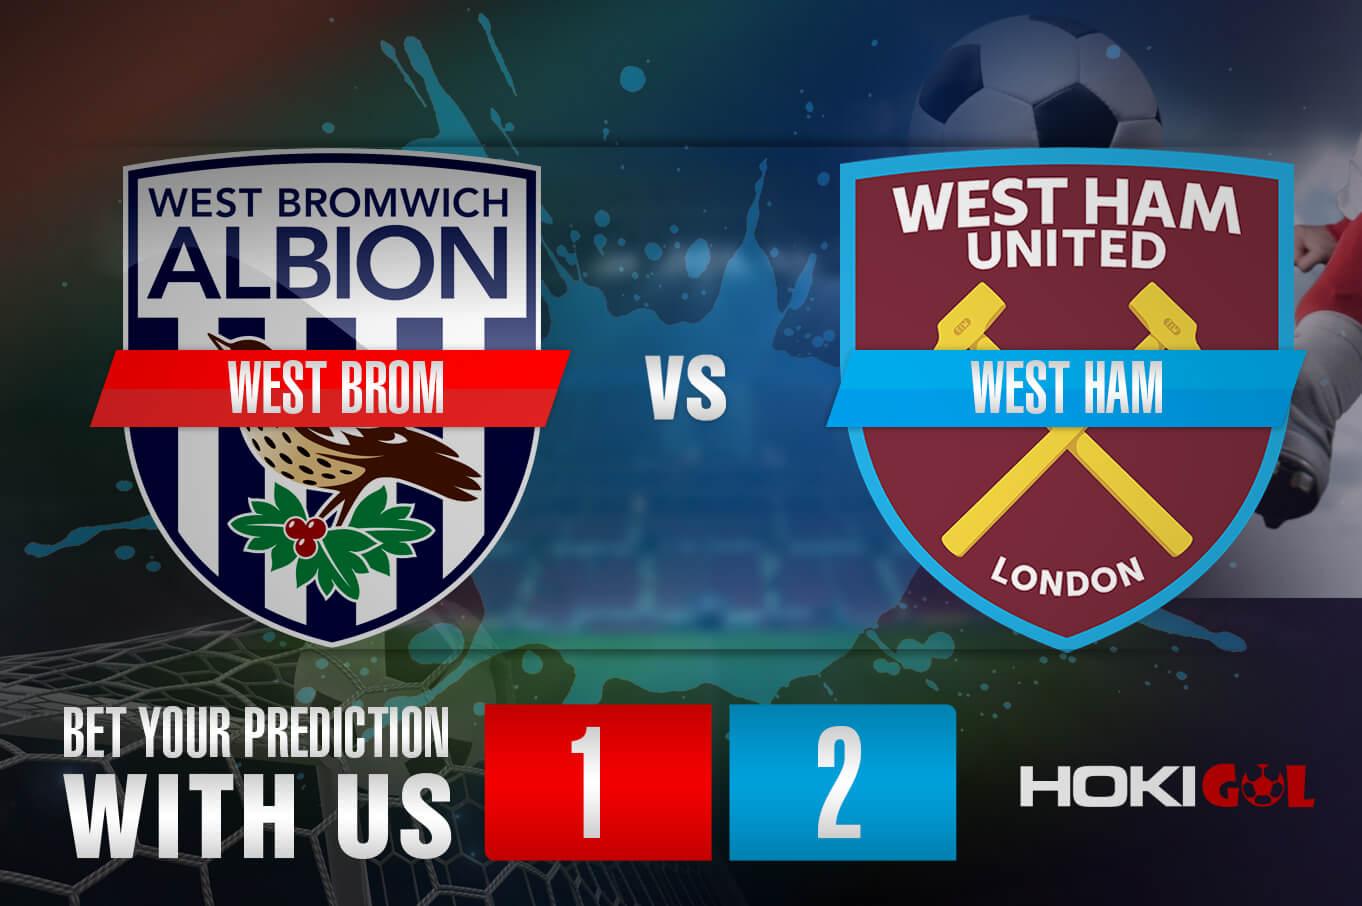 Prediksi Bola West Bromwich Albion FC Vs West Ham 20 Mei 2021